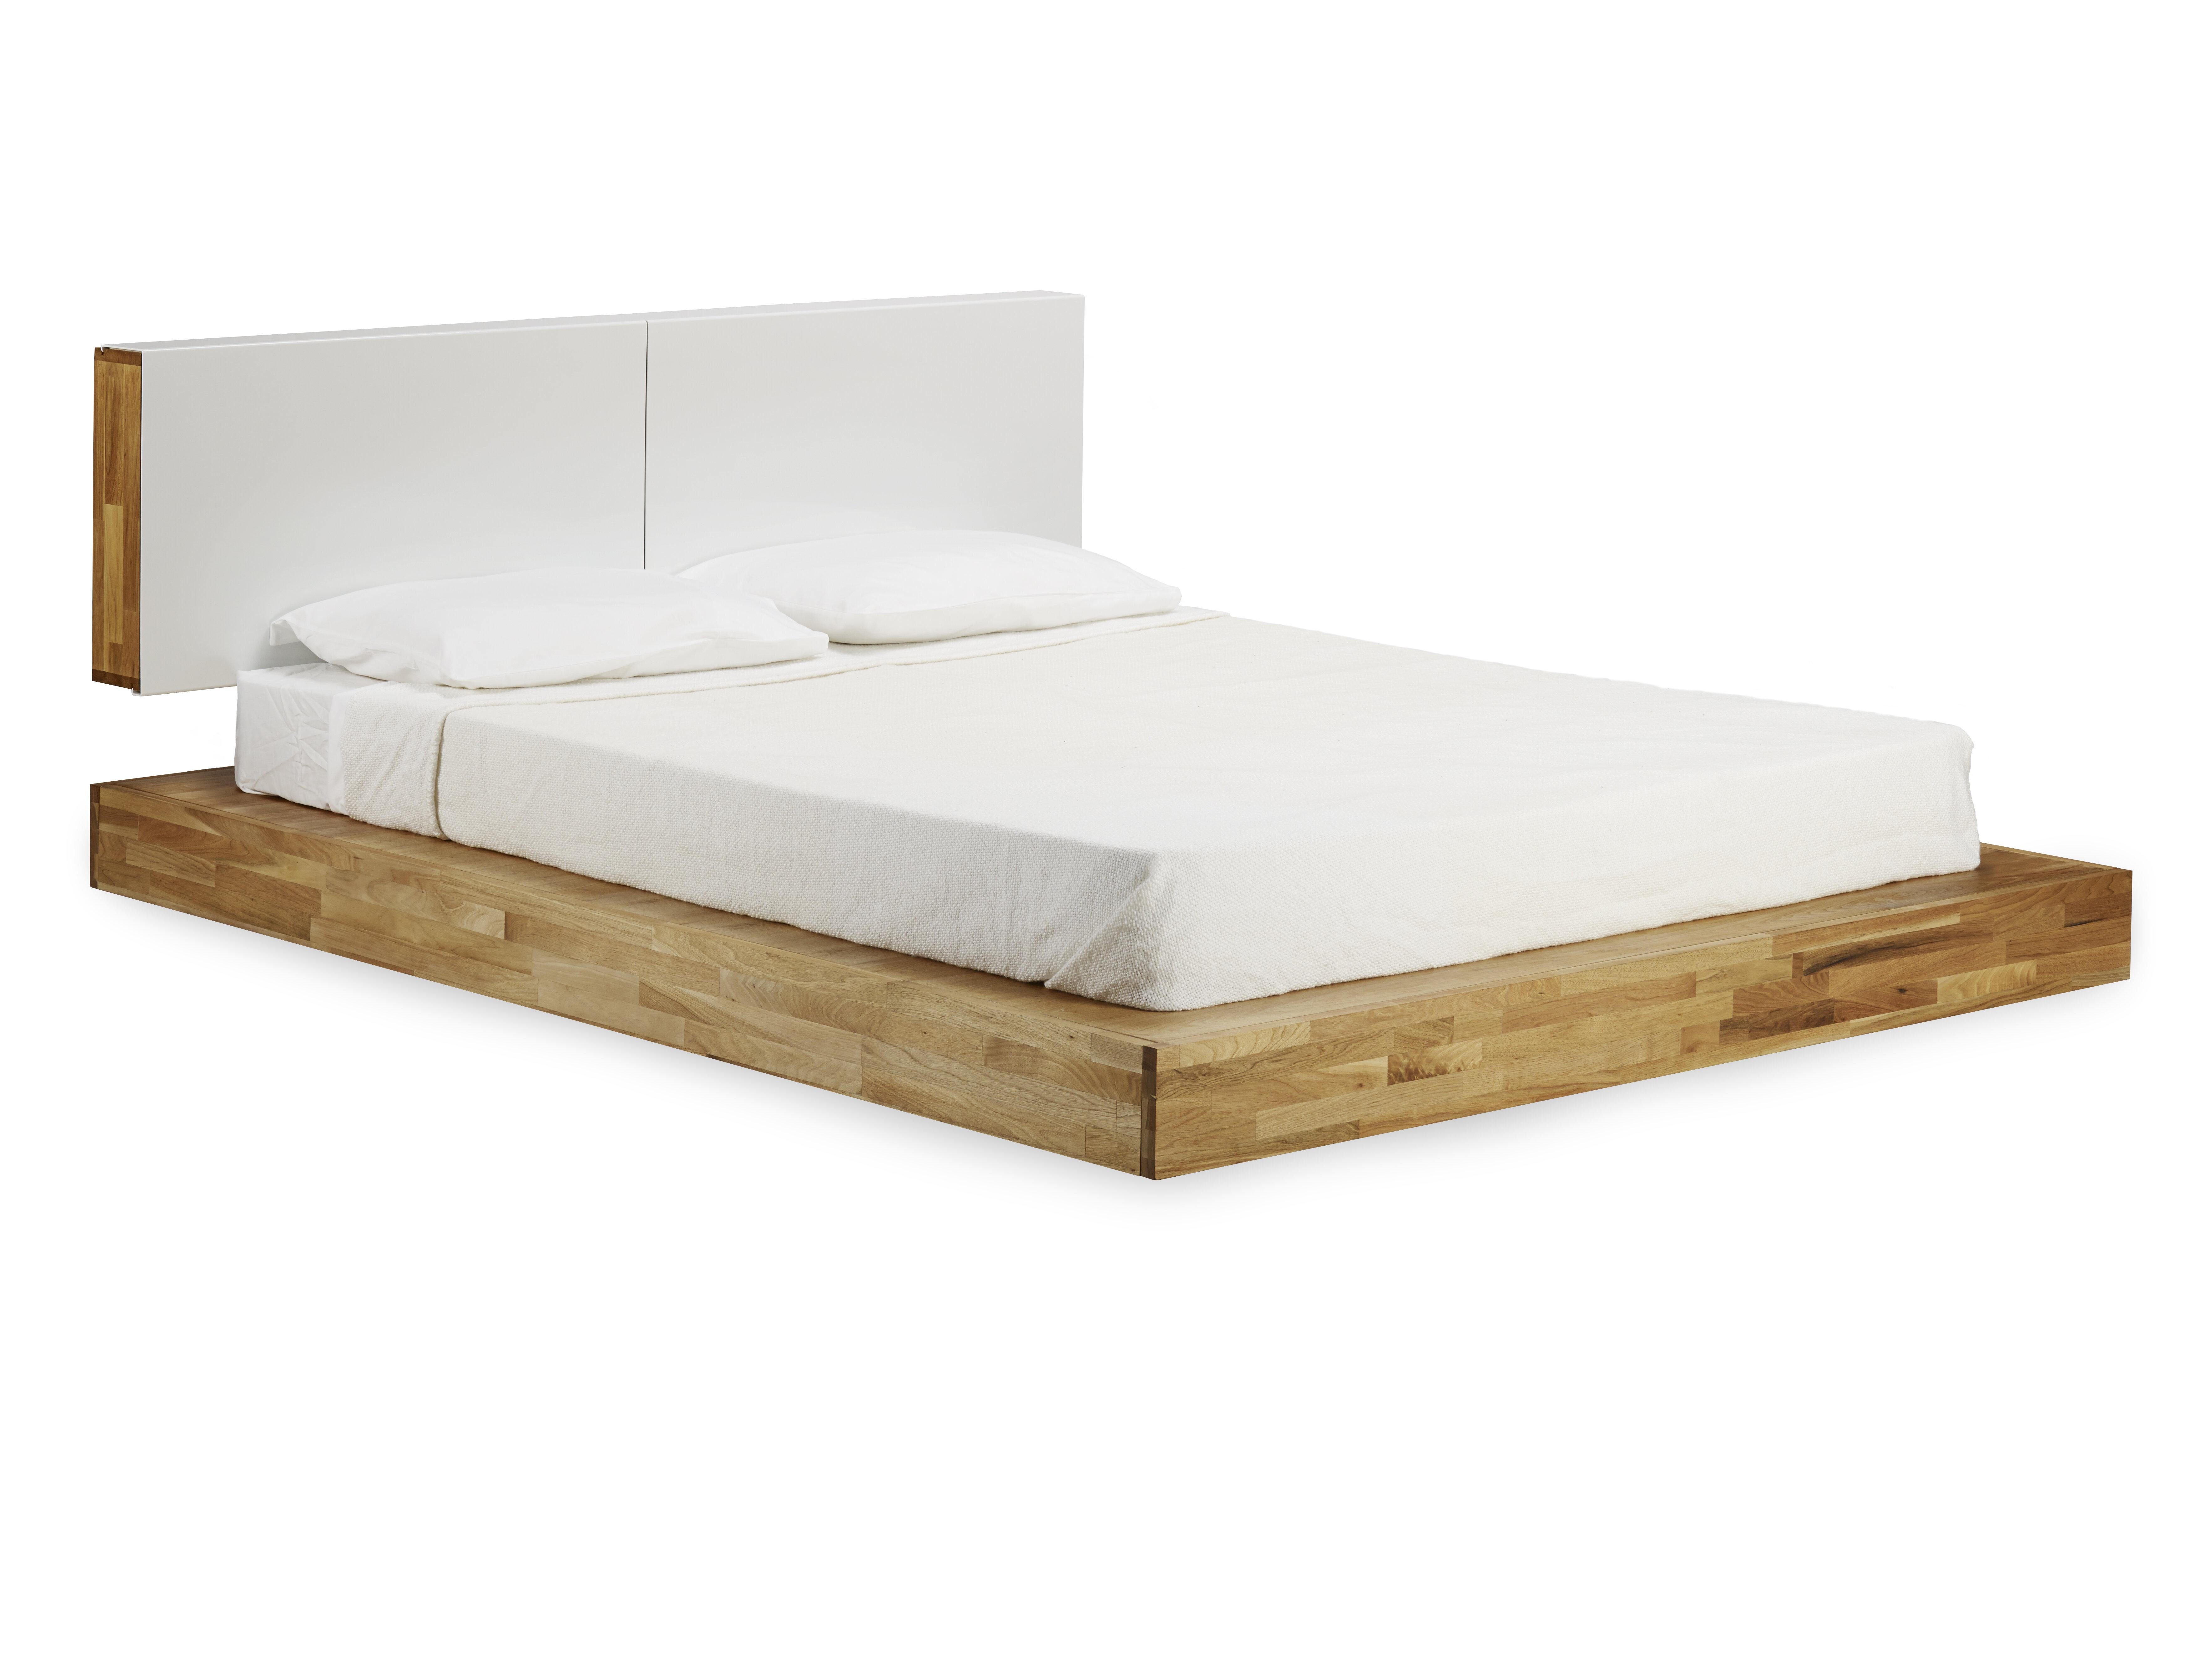 Lax series platform bed reviews allmodern